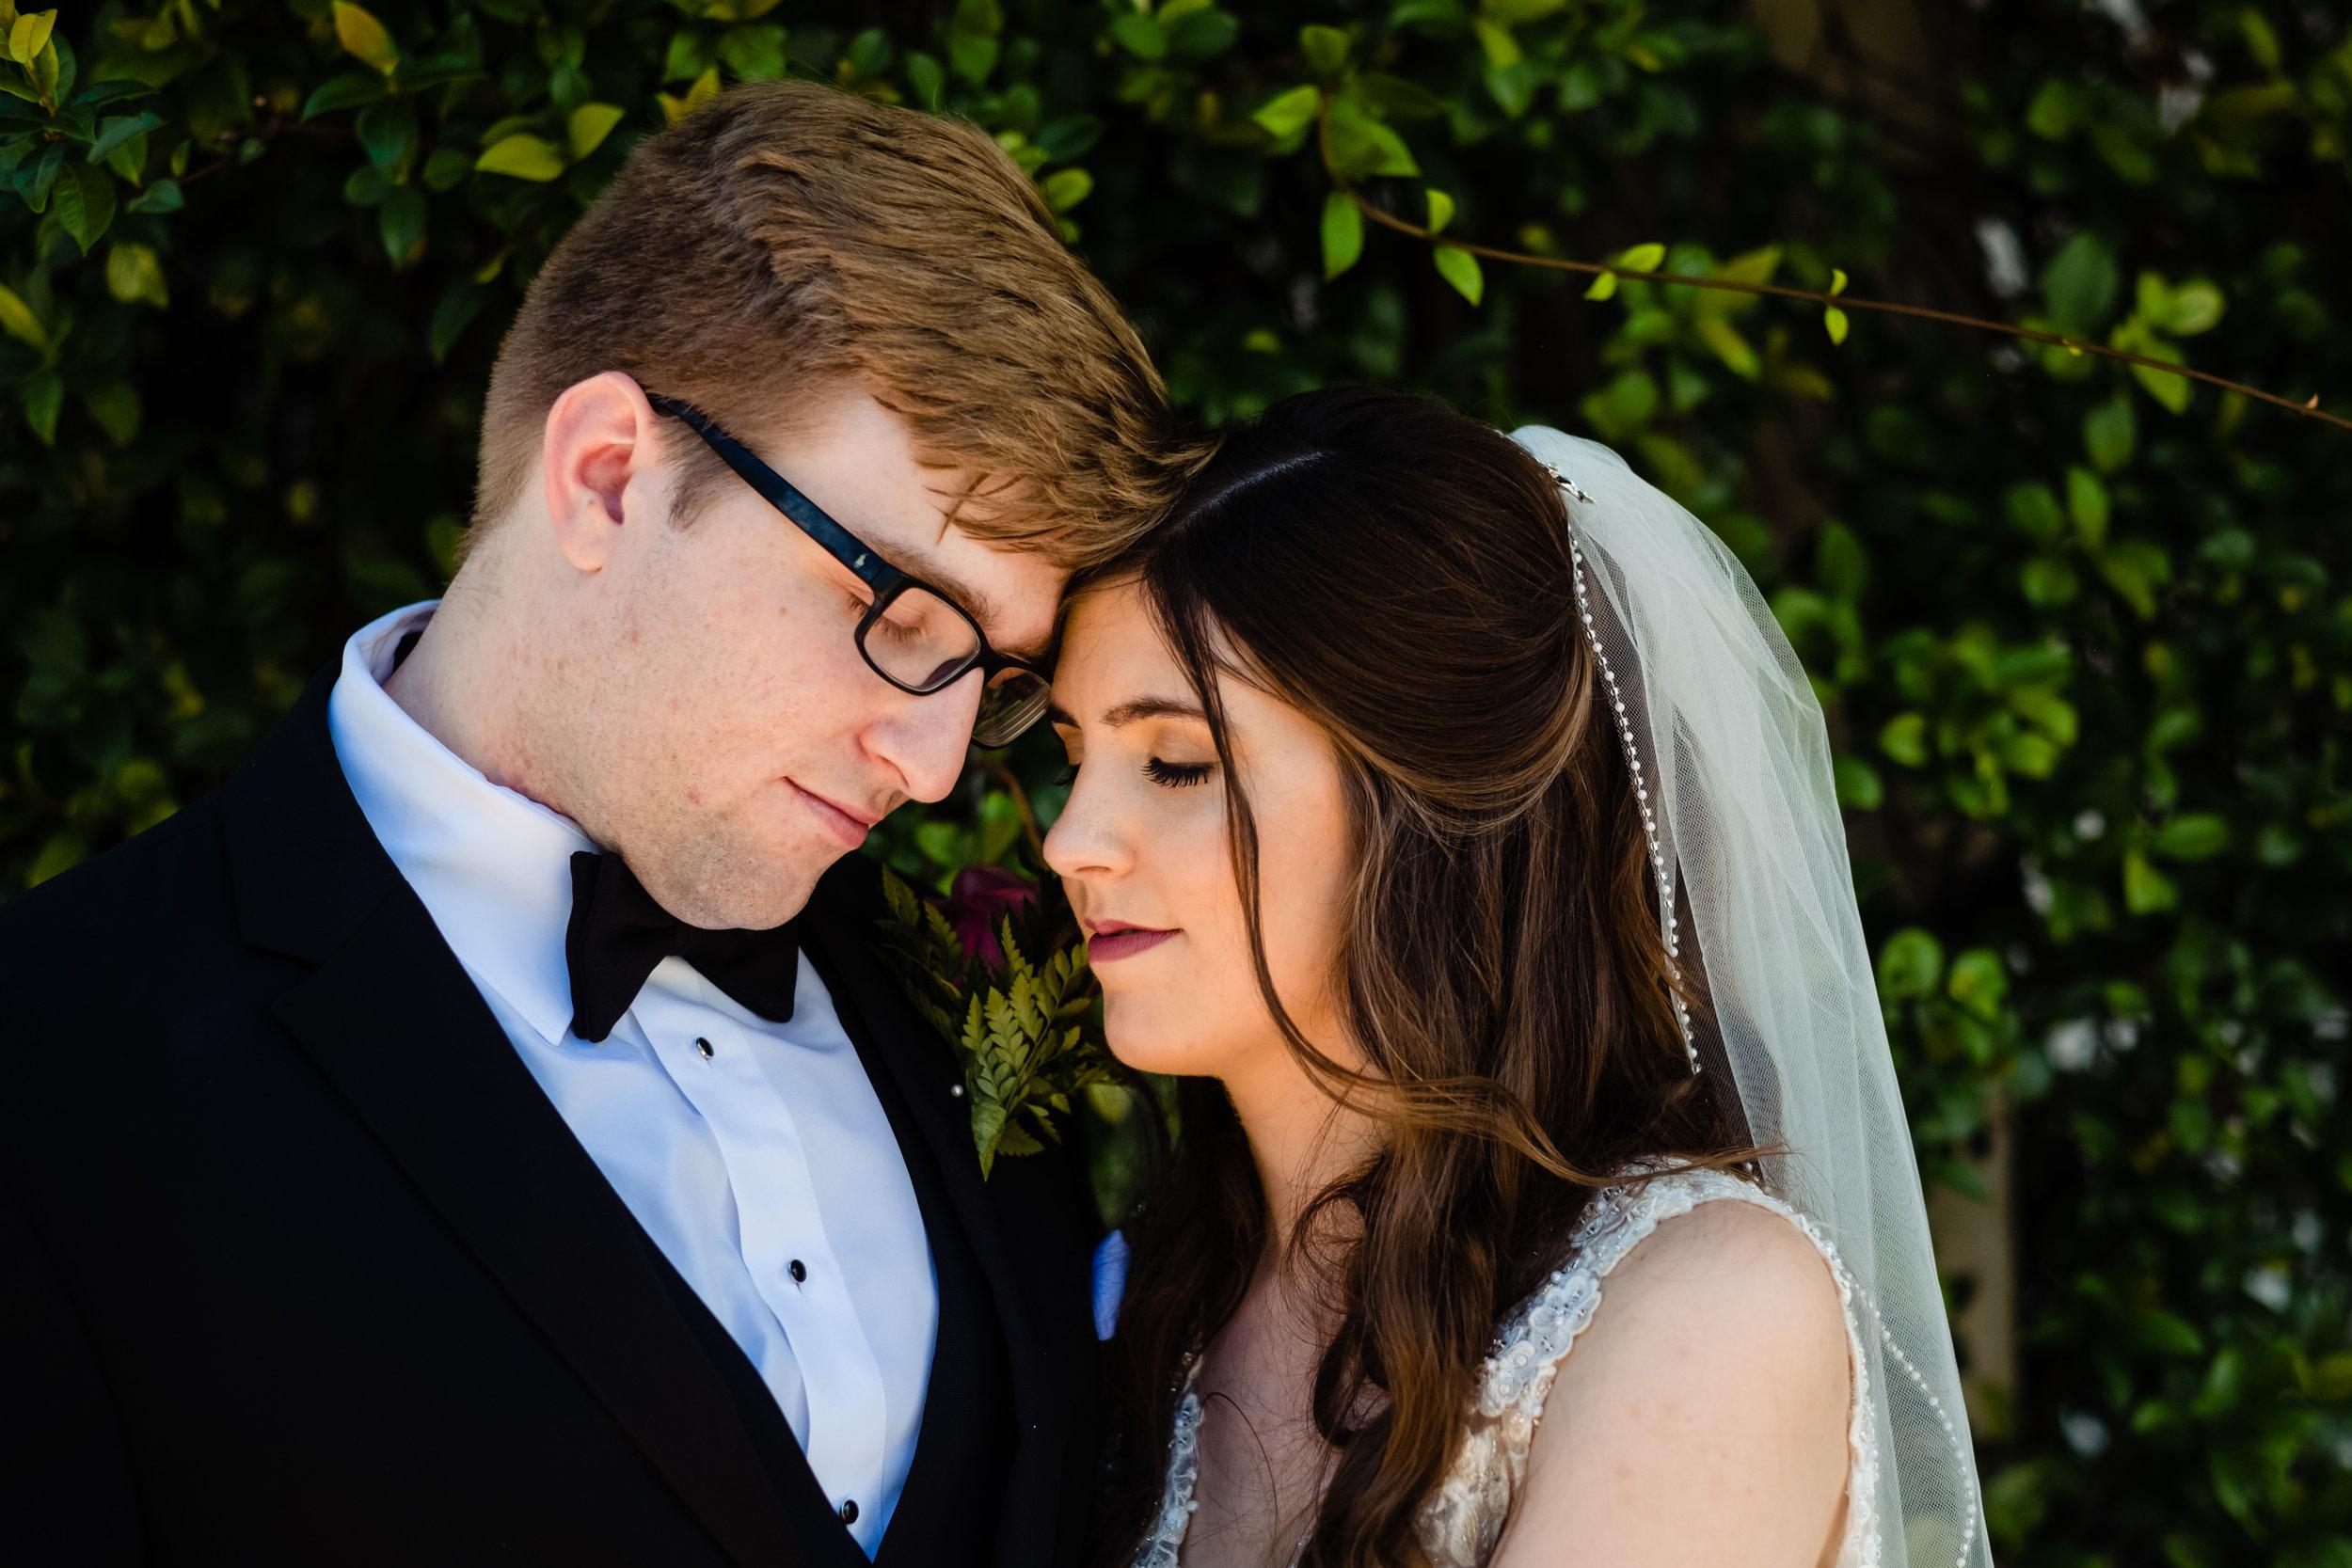 HAH_Zoe and Daniel_Clearwater Wedding_333_2018.jpg